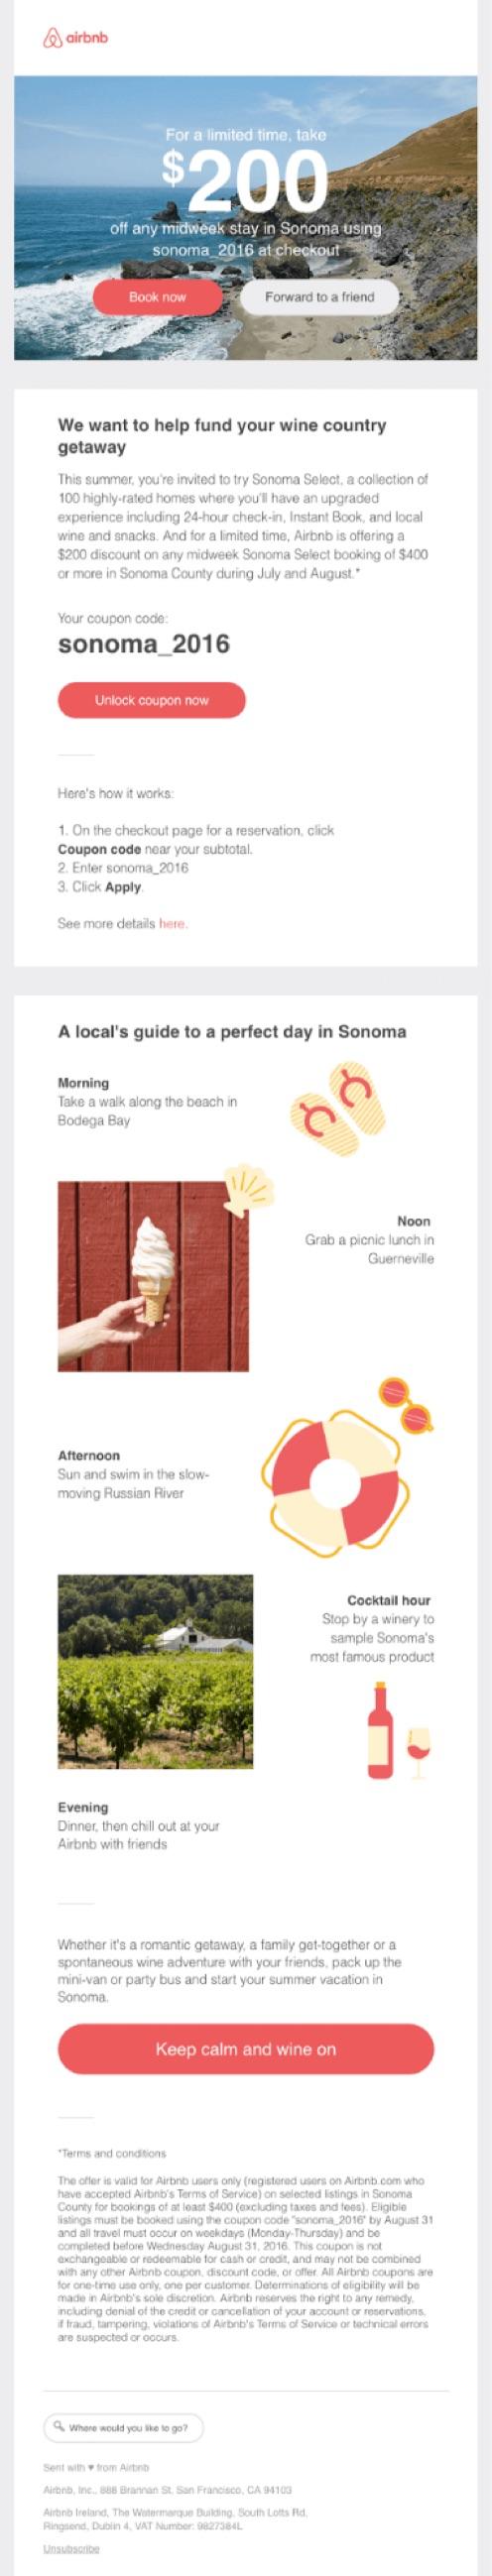 airbnb sonoma behavioral email marketing exp 2